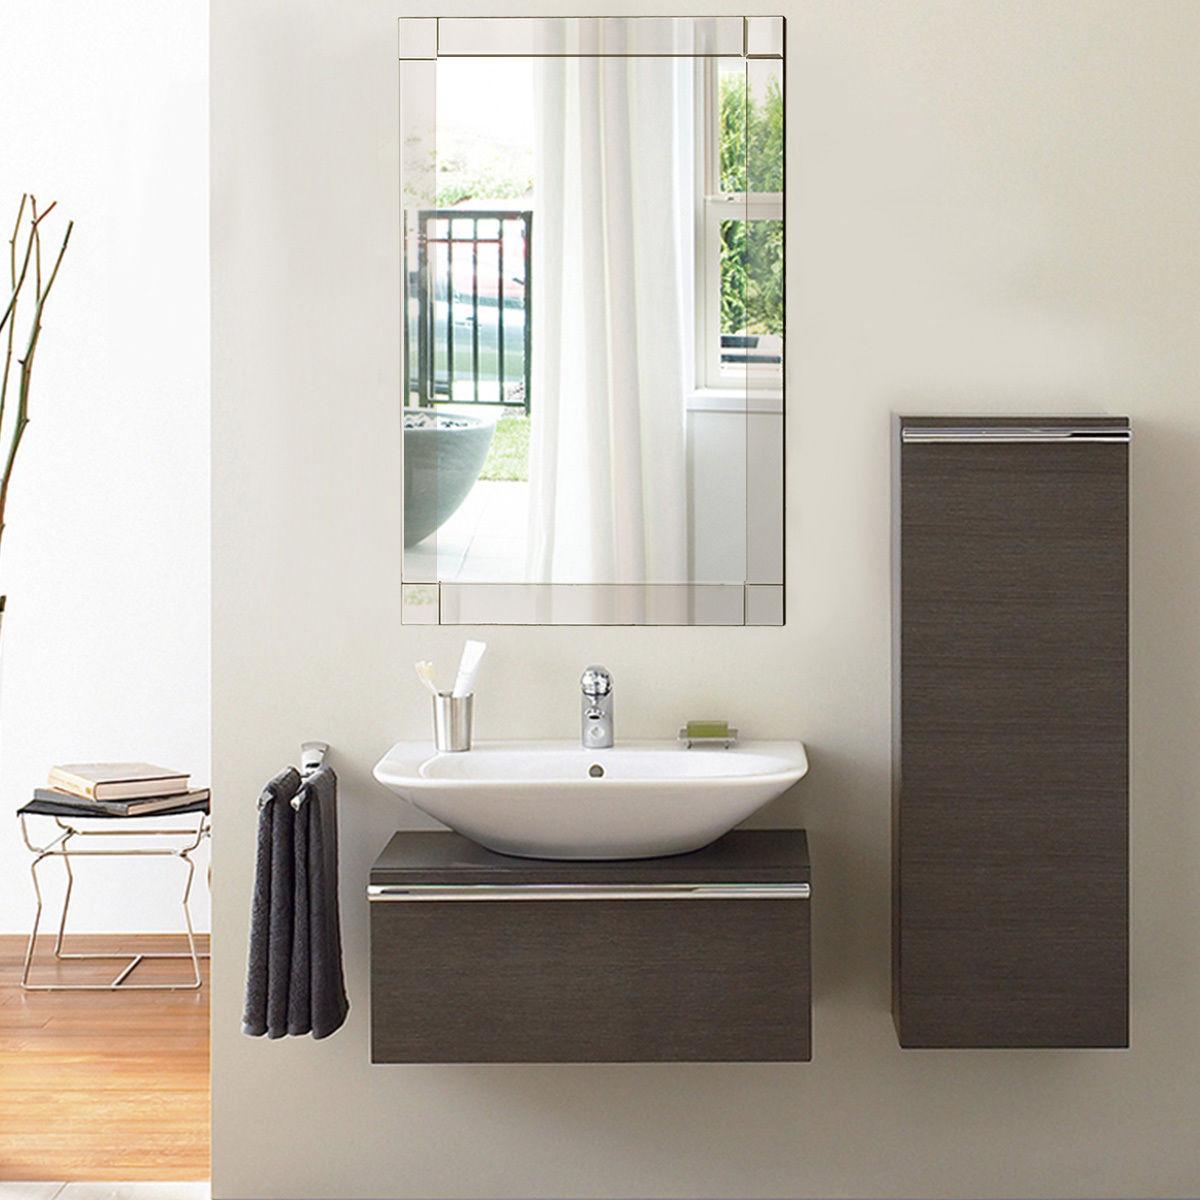 36'' Wall Mirror Rectangle Vanity Makeup Mirror Decor MDF Frame Bathroom Home - image 2 of 8